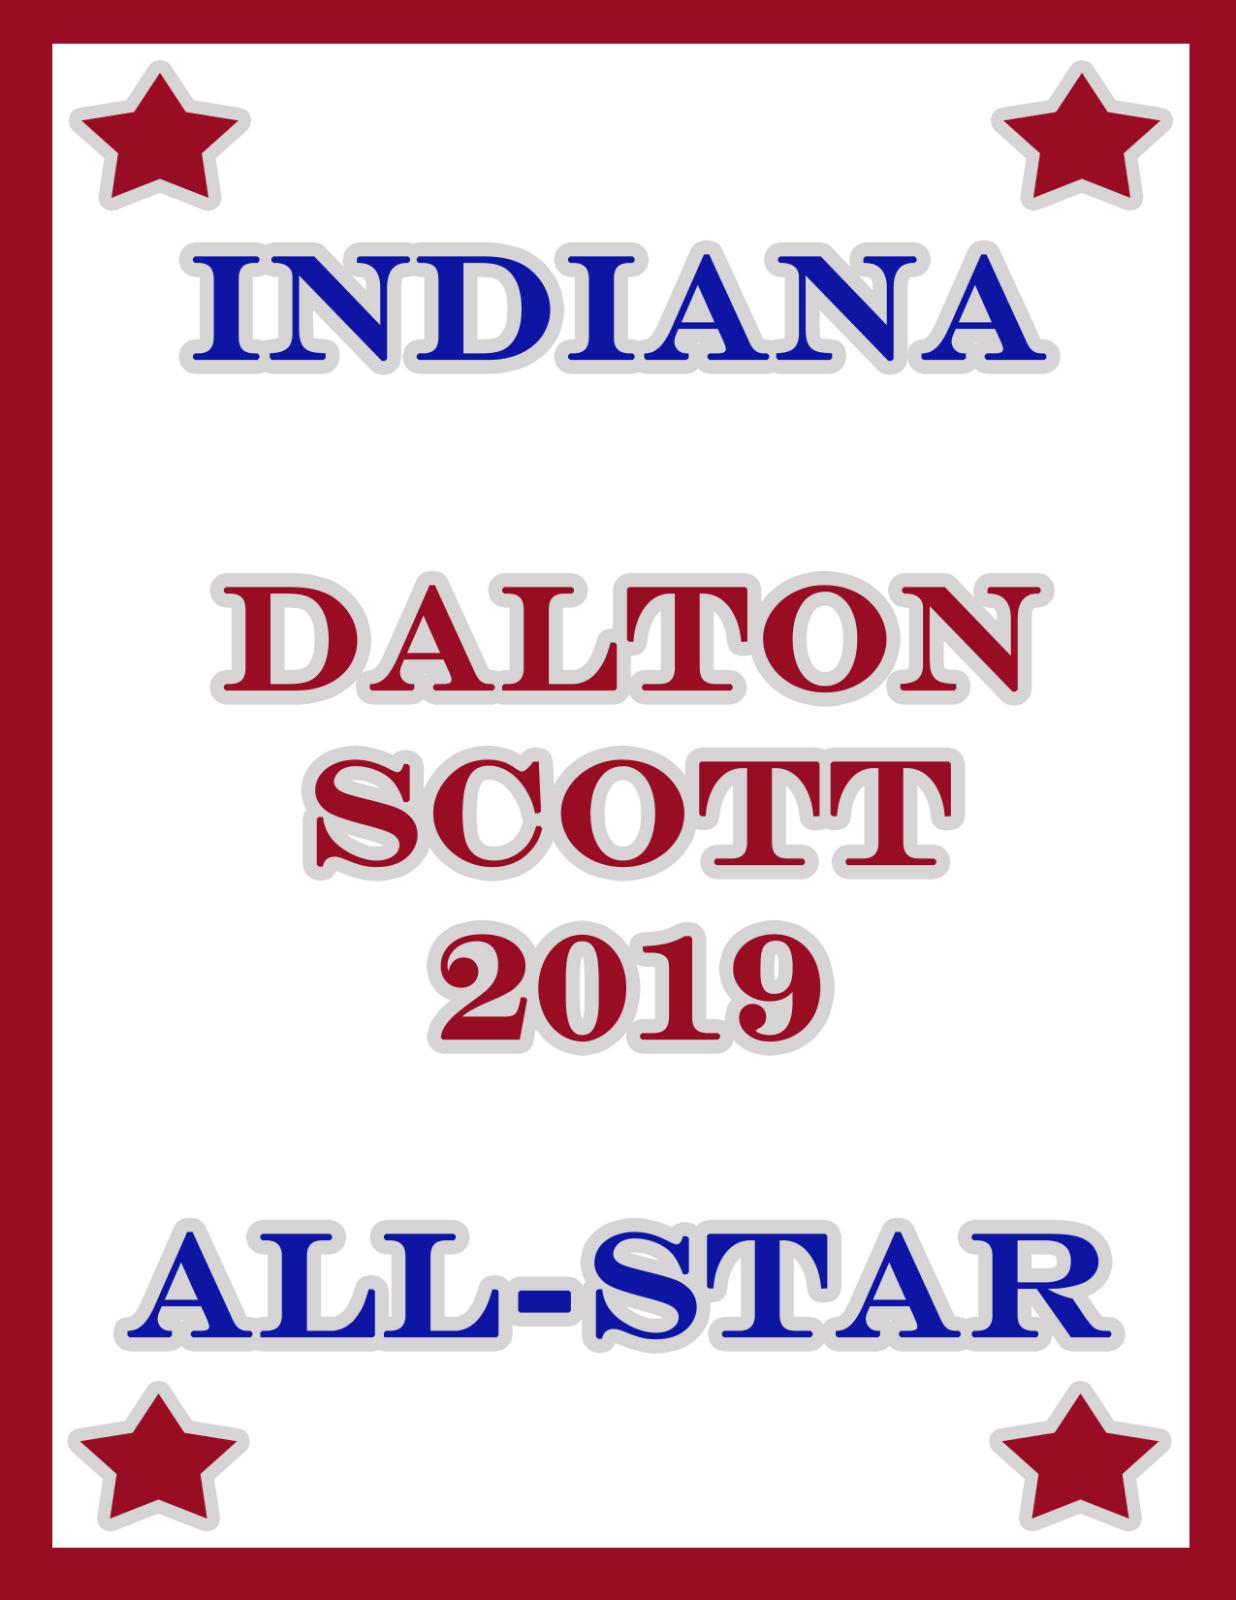 Indiana All-Star:  Dalton Scott